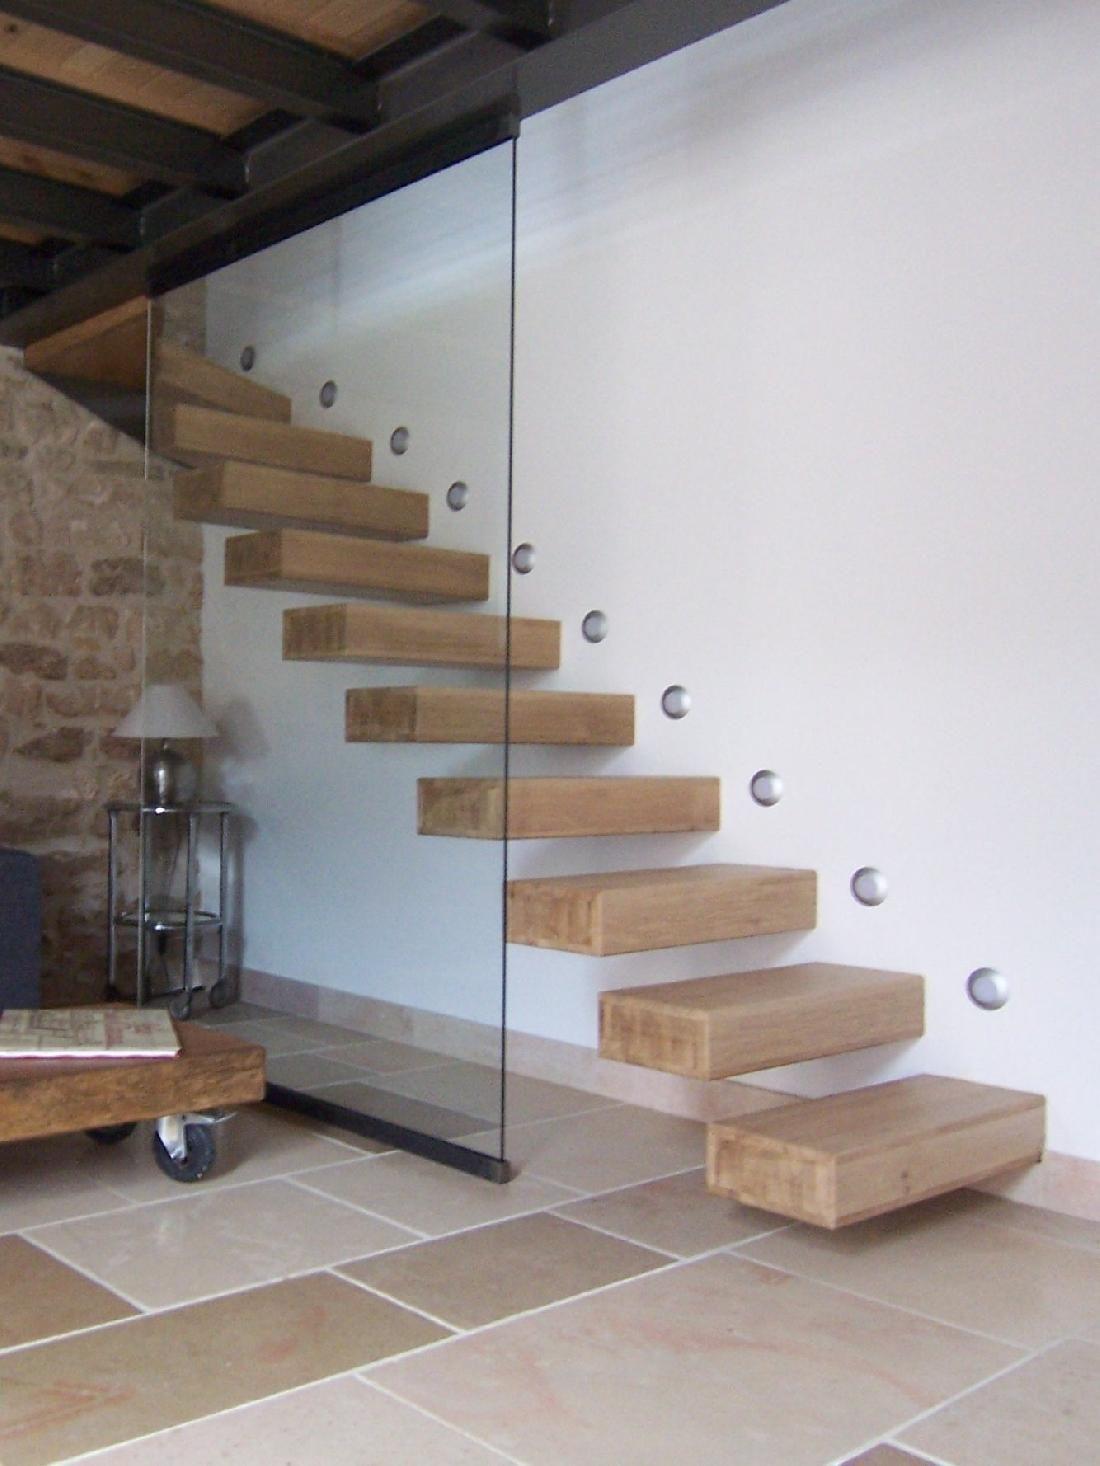 Suspendu Integral Creasfer Chene Escalier Suspendu Avec Structure Metallique Marches En Chene Claustra En Ve Escalier Suspendu Escalier Bois Escalier